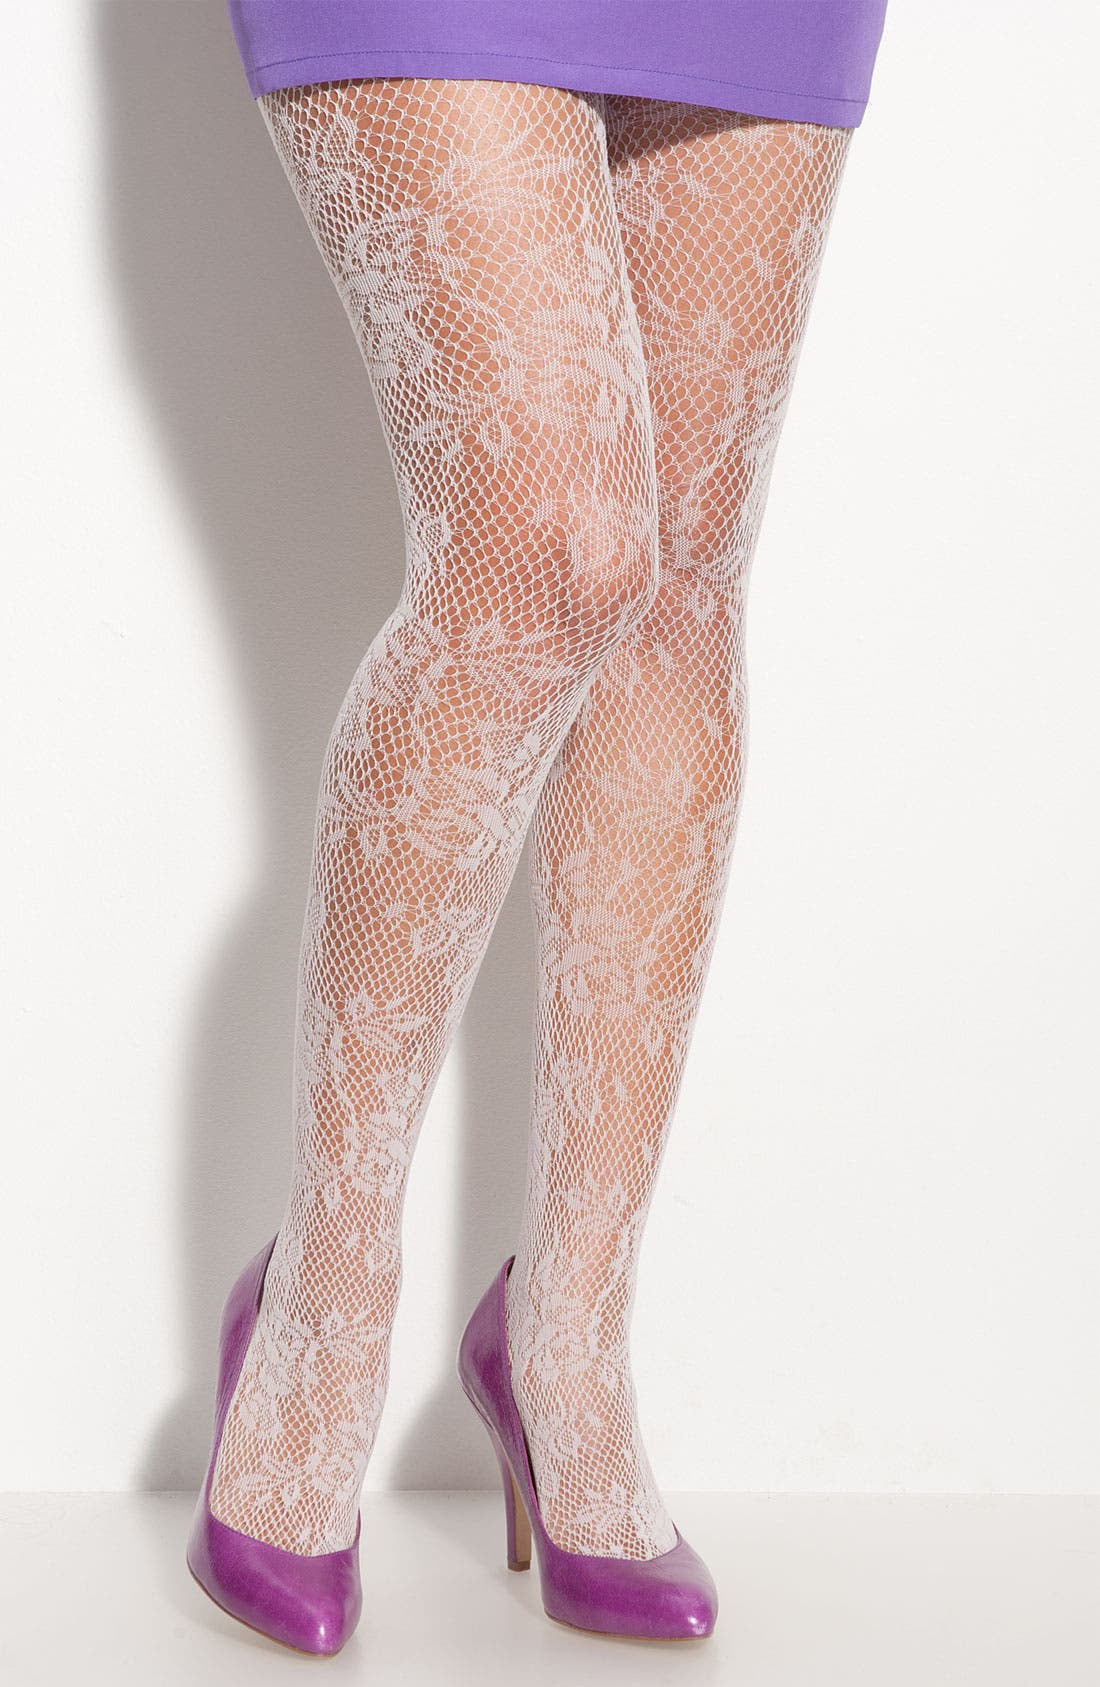 Alternate Image 1 Selected - Hue 'Rose Floral' Fishnet Stockings (2 for $22)